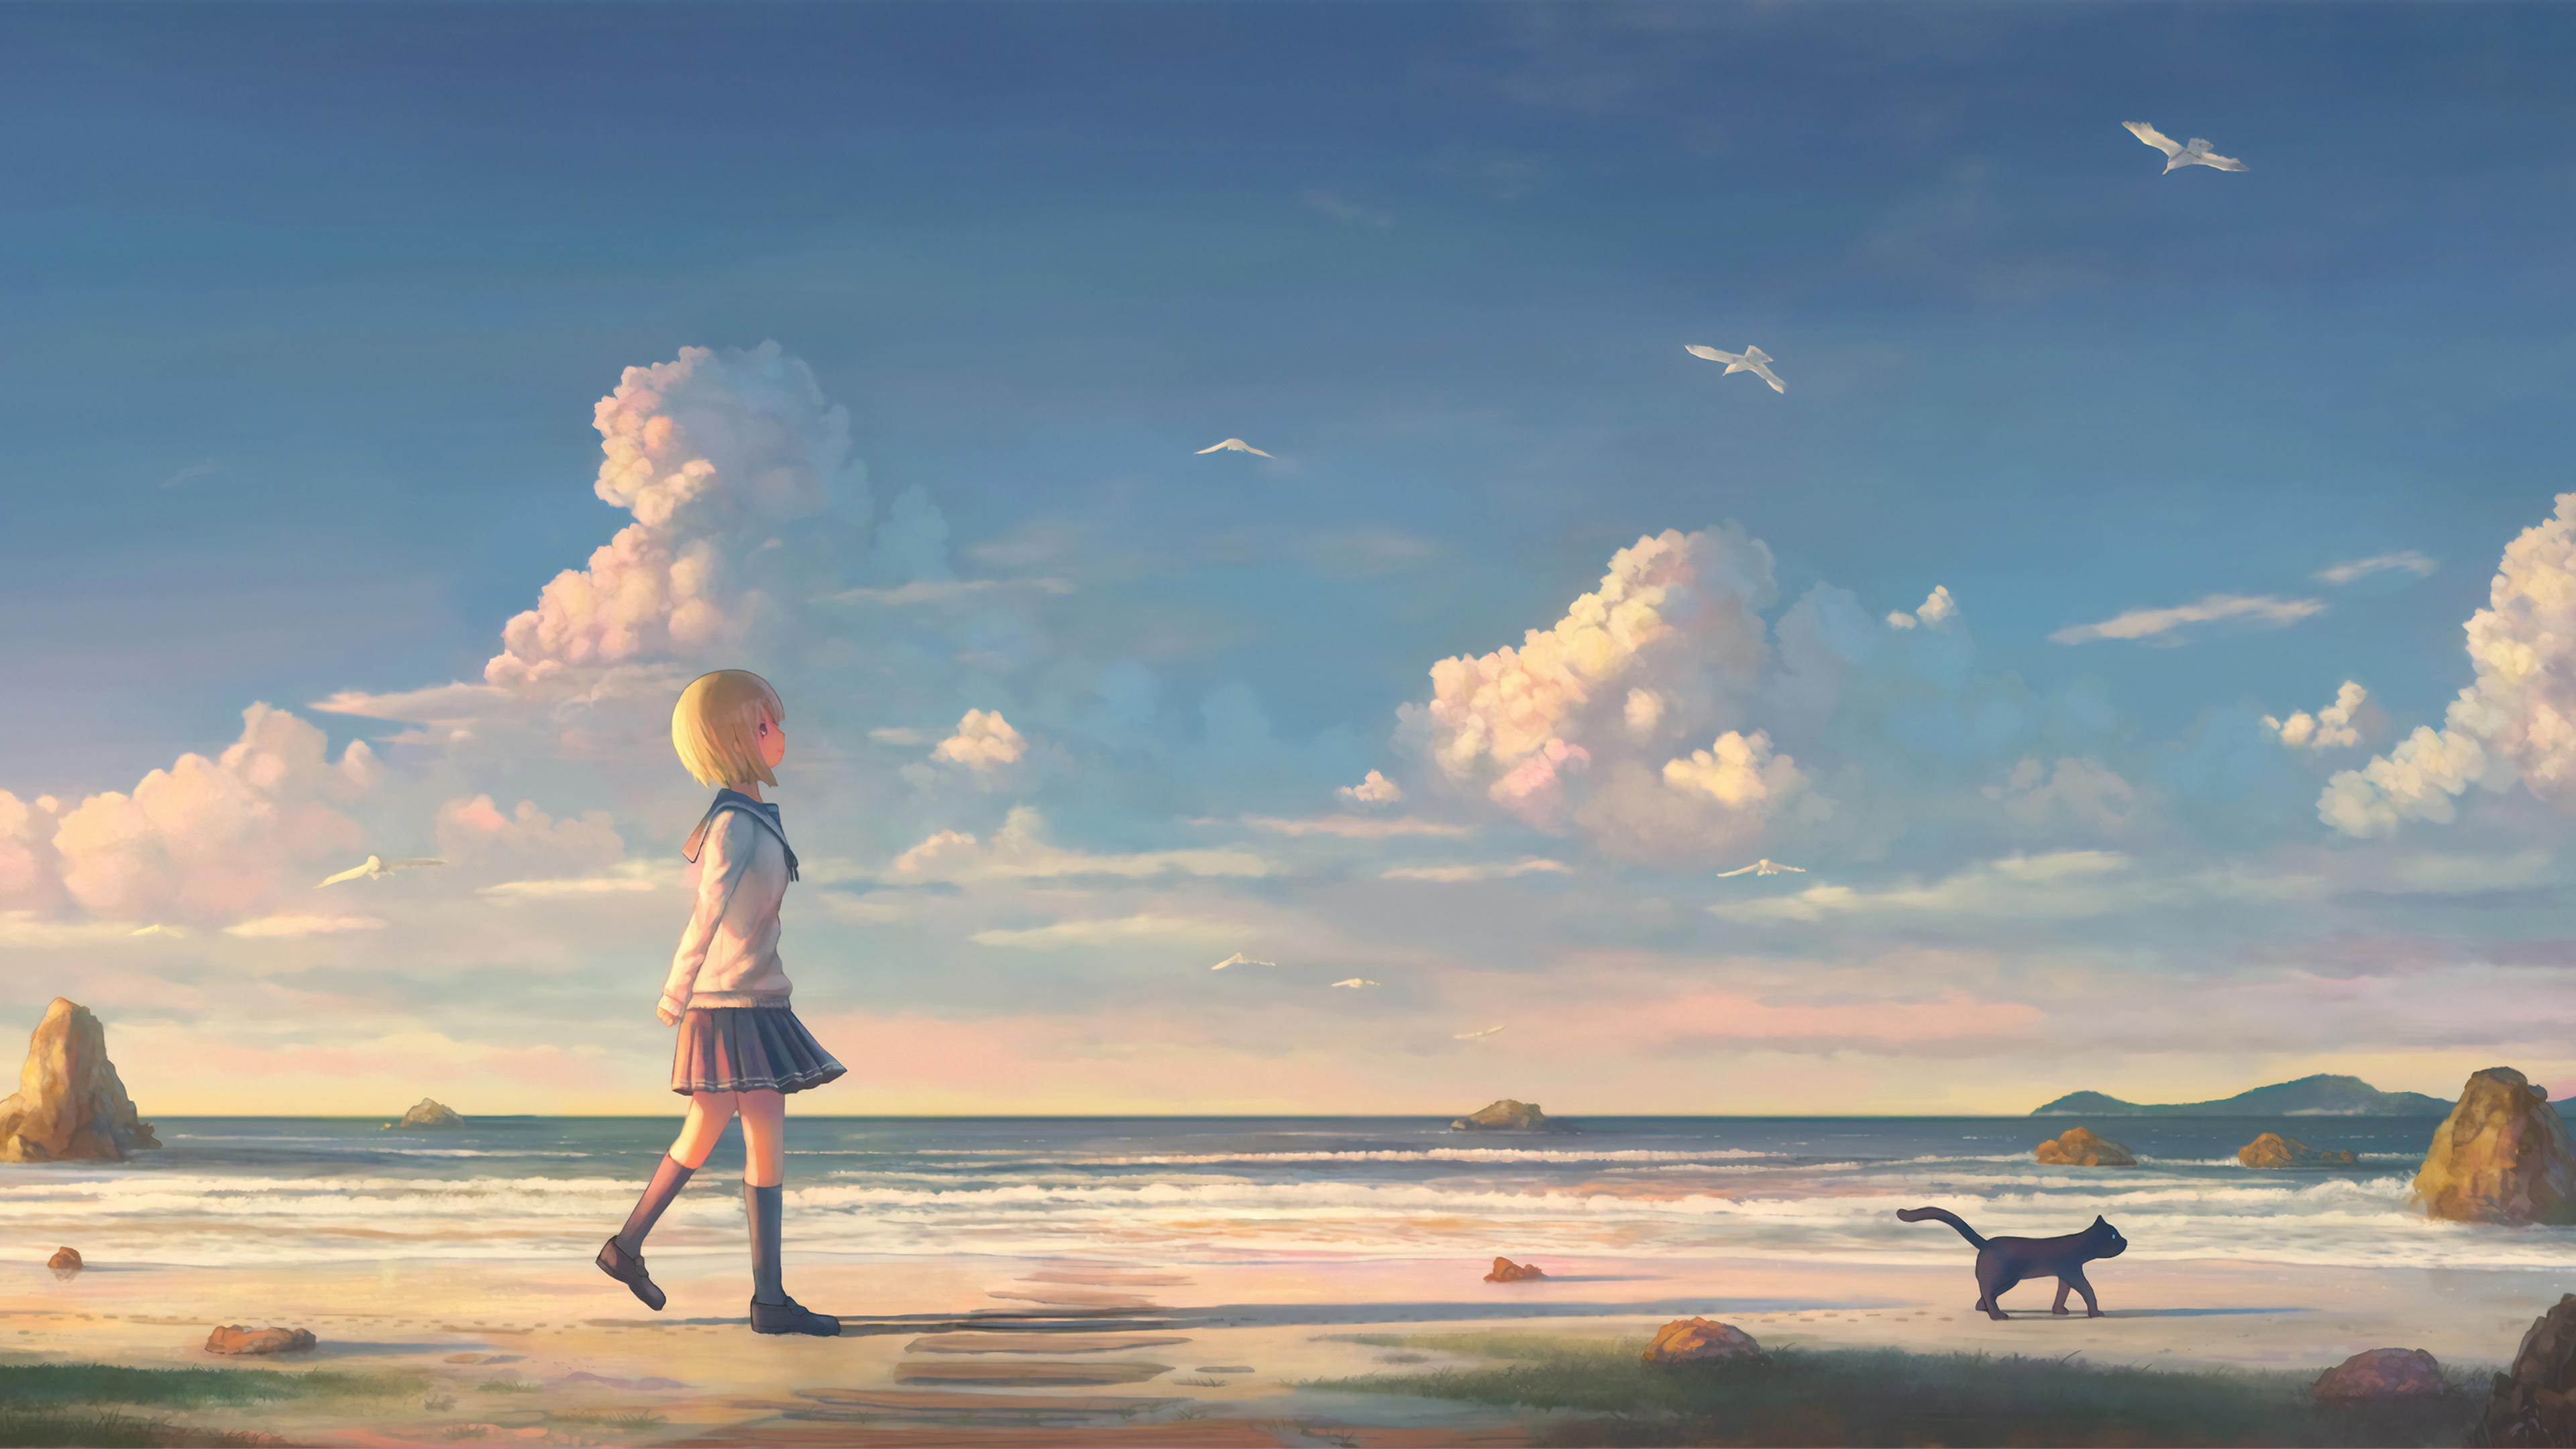 anime girl walking on beach with cat 1563222600 - Anime Girl Walking On Beach With Cat - hd-wallpapers, digital art wallpapers, artwork wallpapers, artist wallpapers, anime wallpapers, anime girl wallpapers, 4k-wallpapers